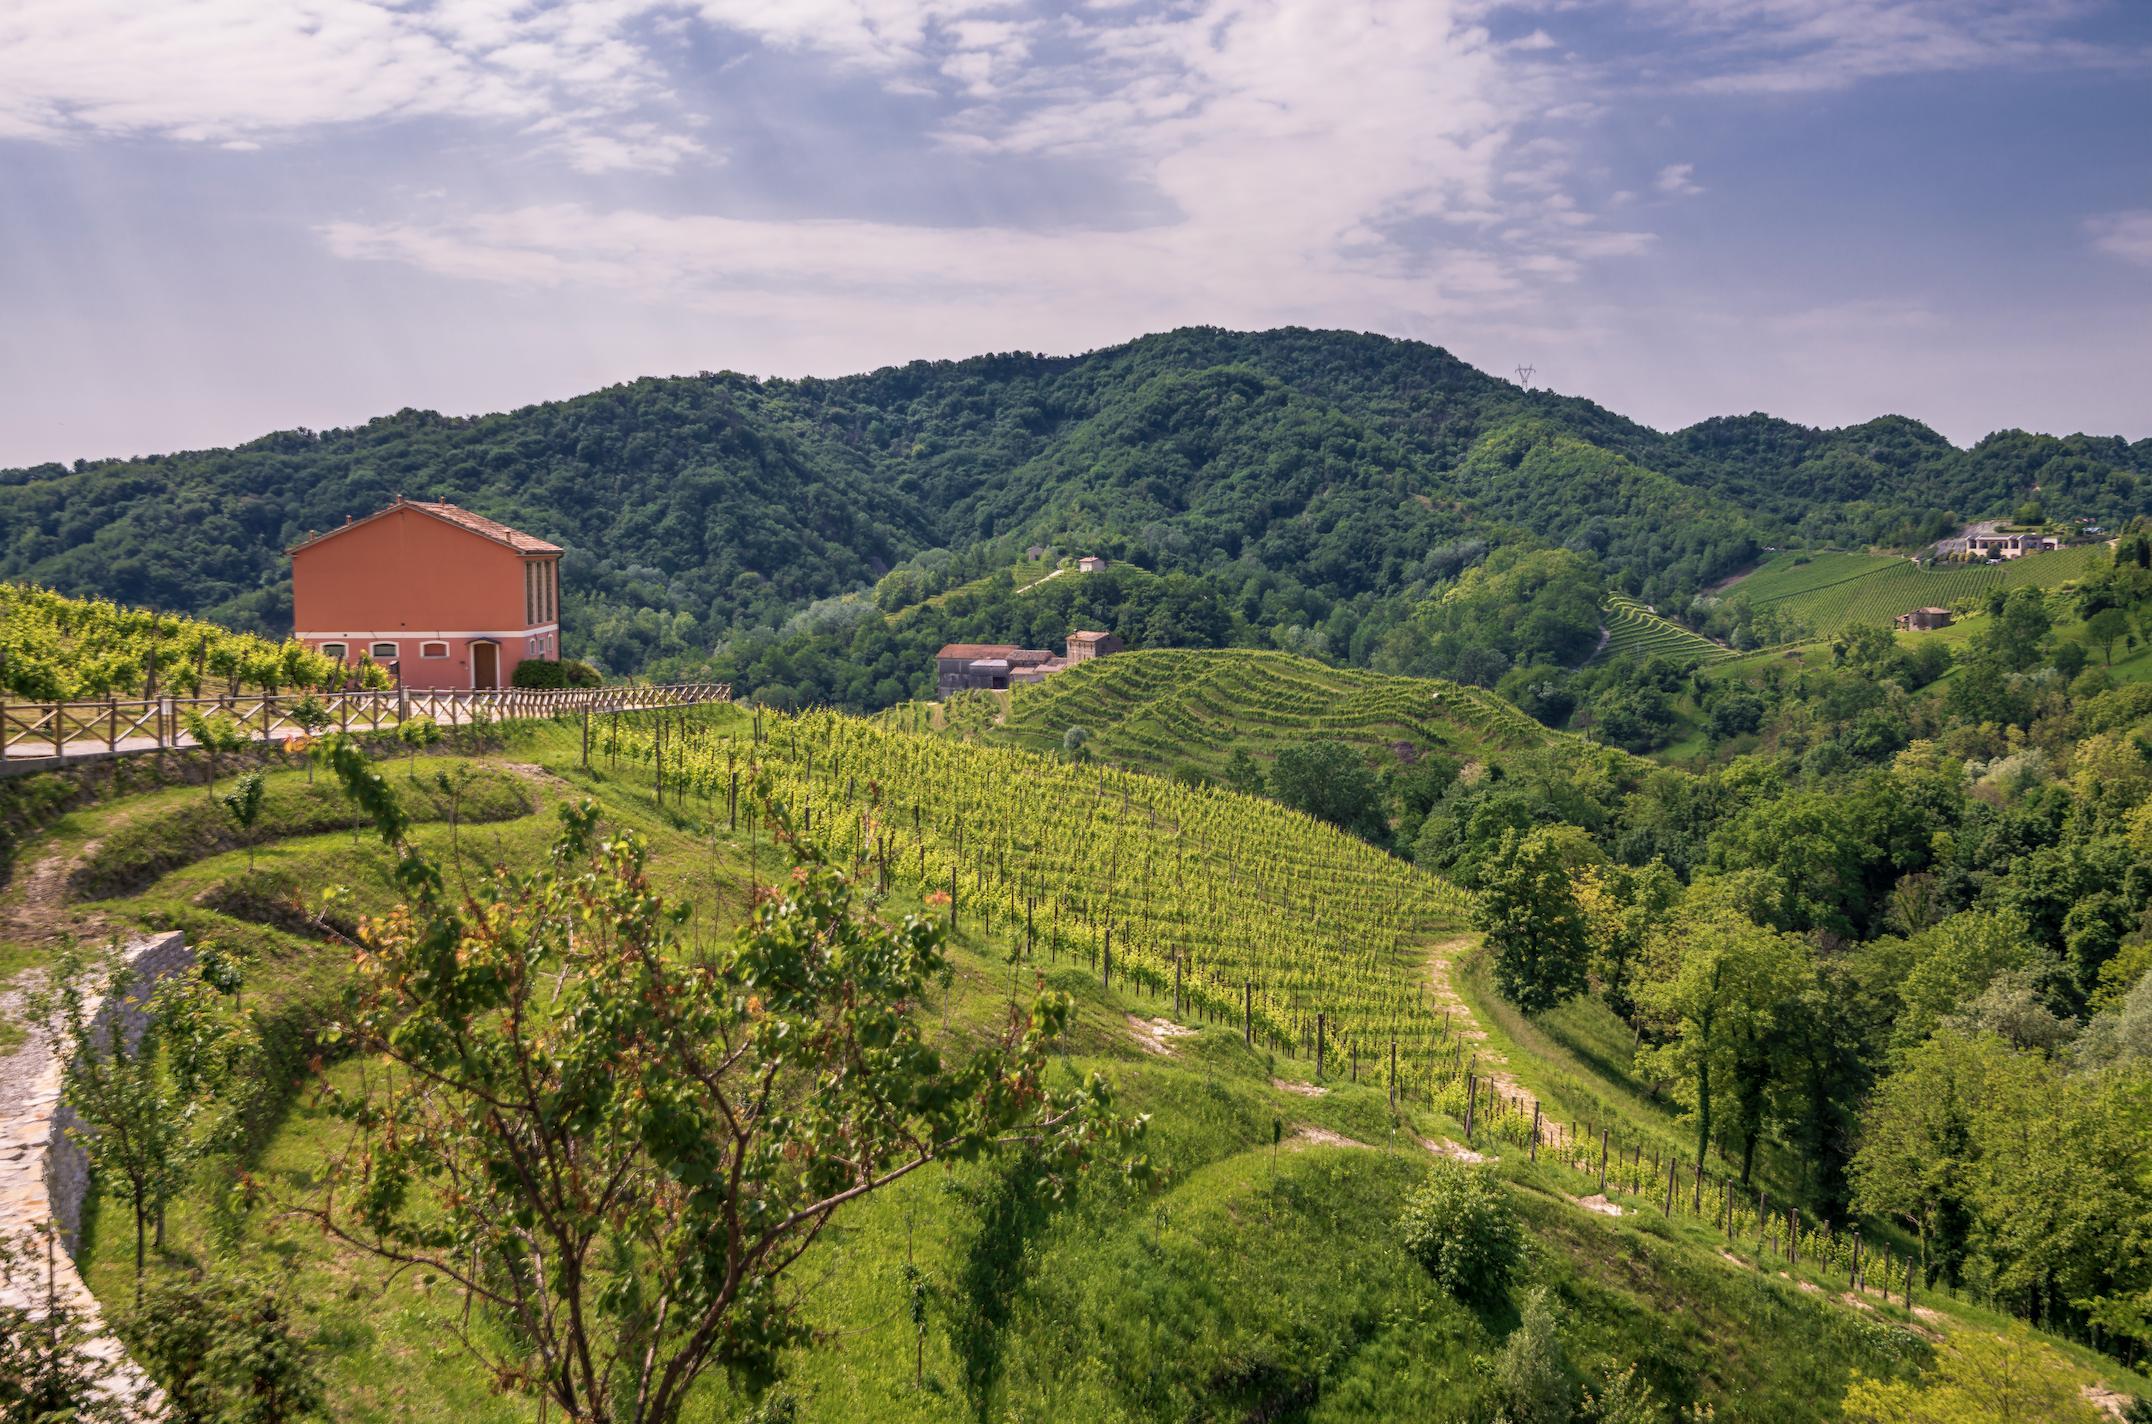 Prosecco vineyards